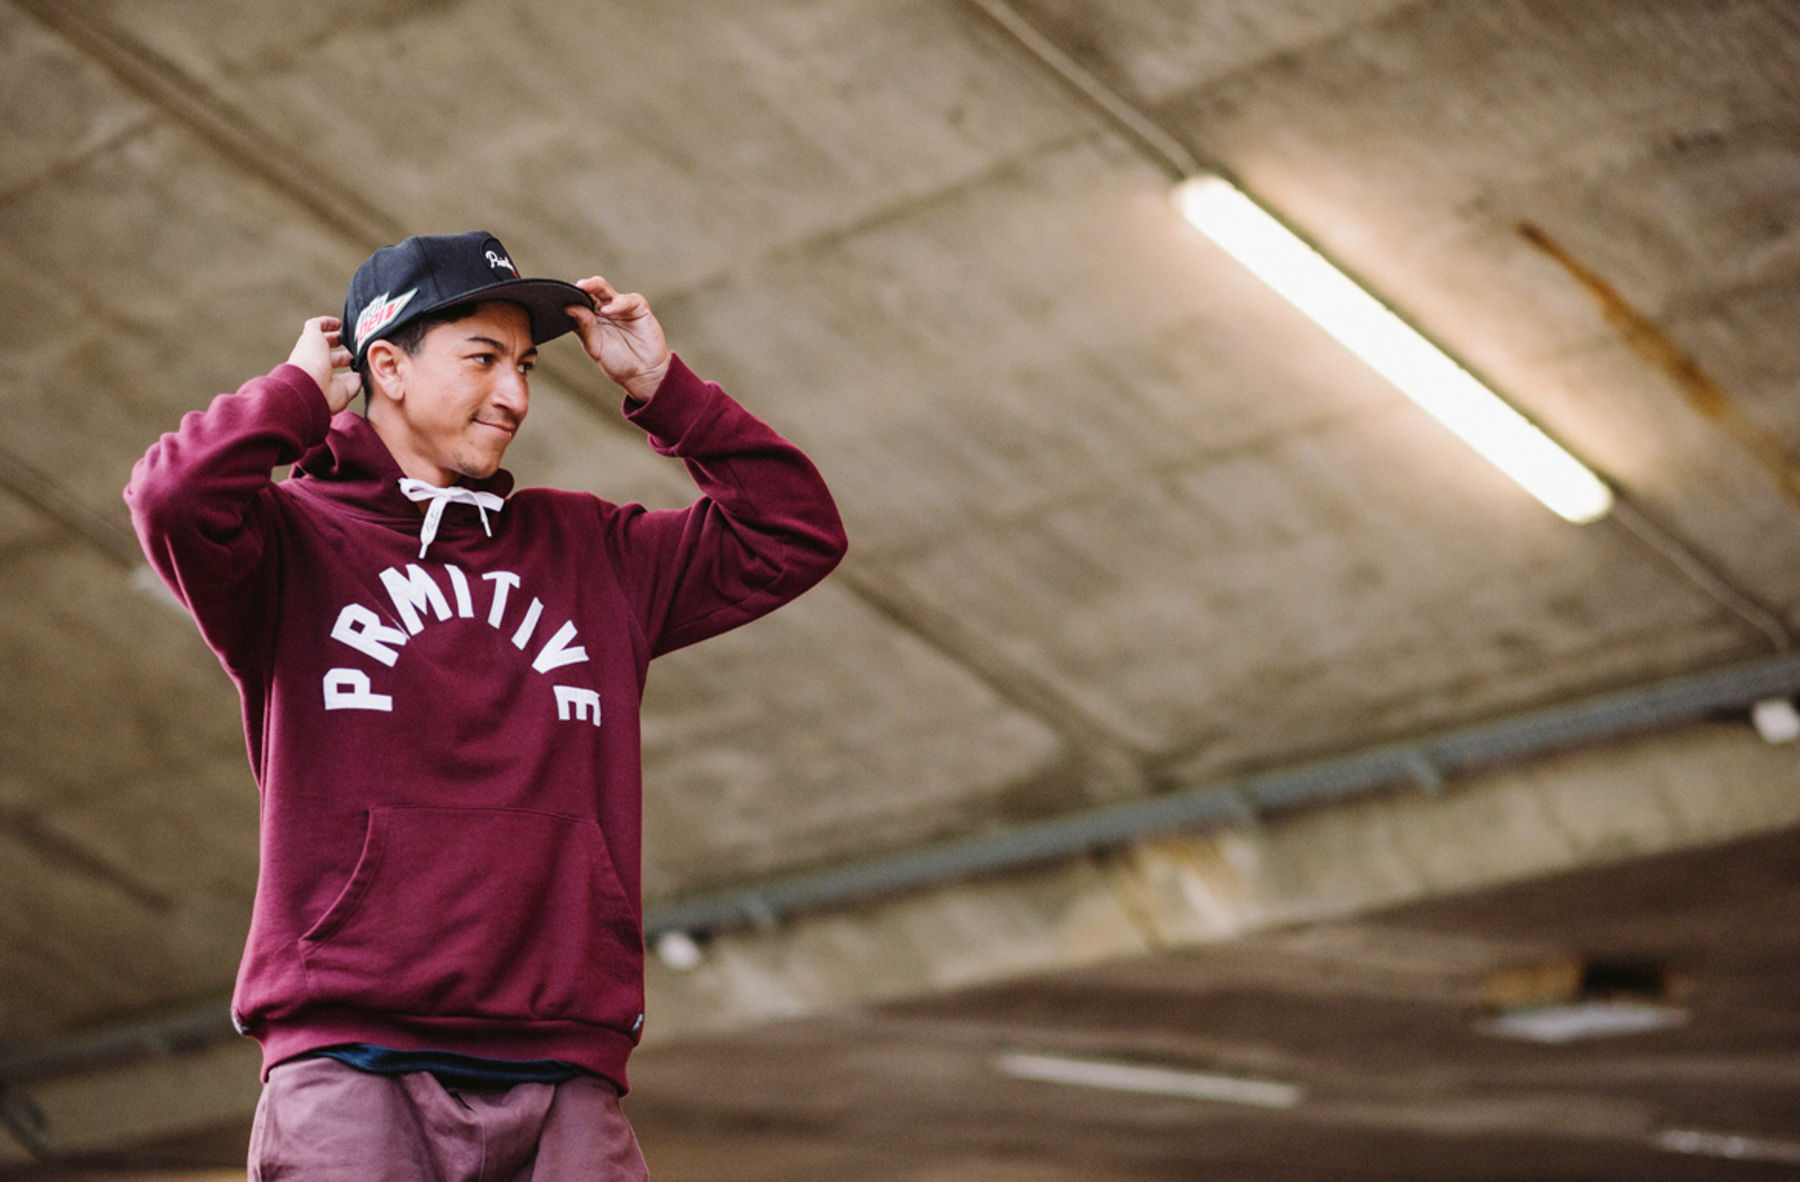 _IHC2471e-Nick-Tucker-Primitive-Skateboards-Demo-BaySixty6-London-May-2015-Photographer-Maksim-Kalanep